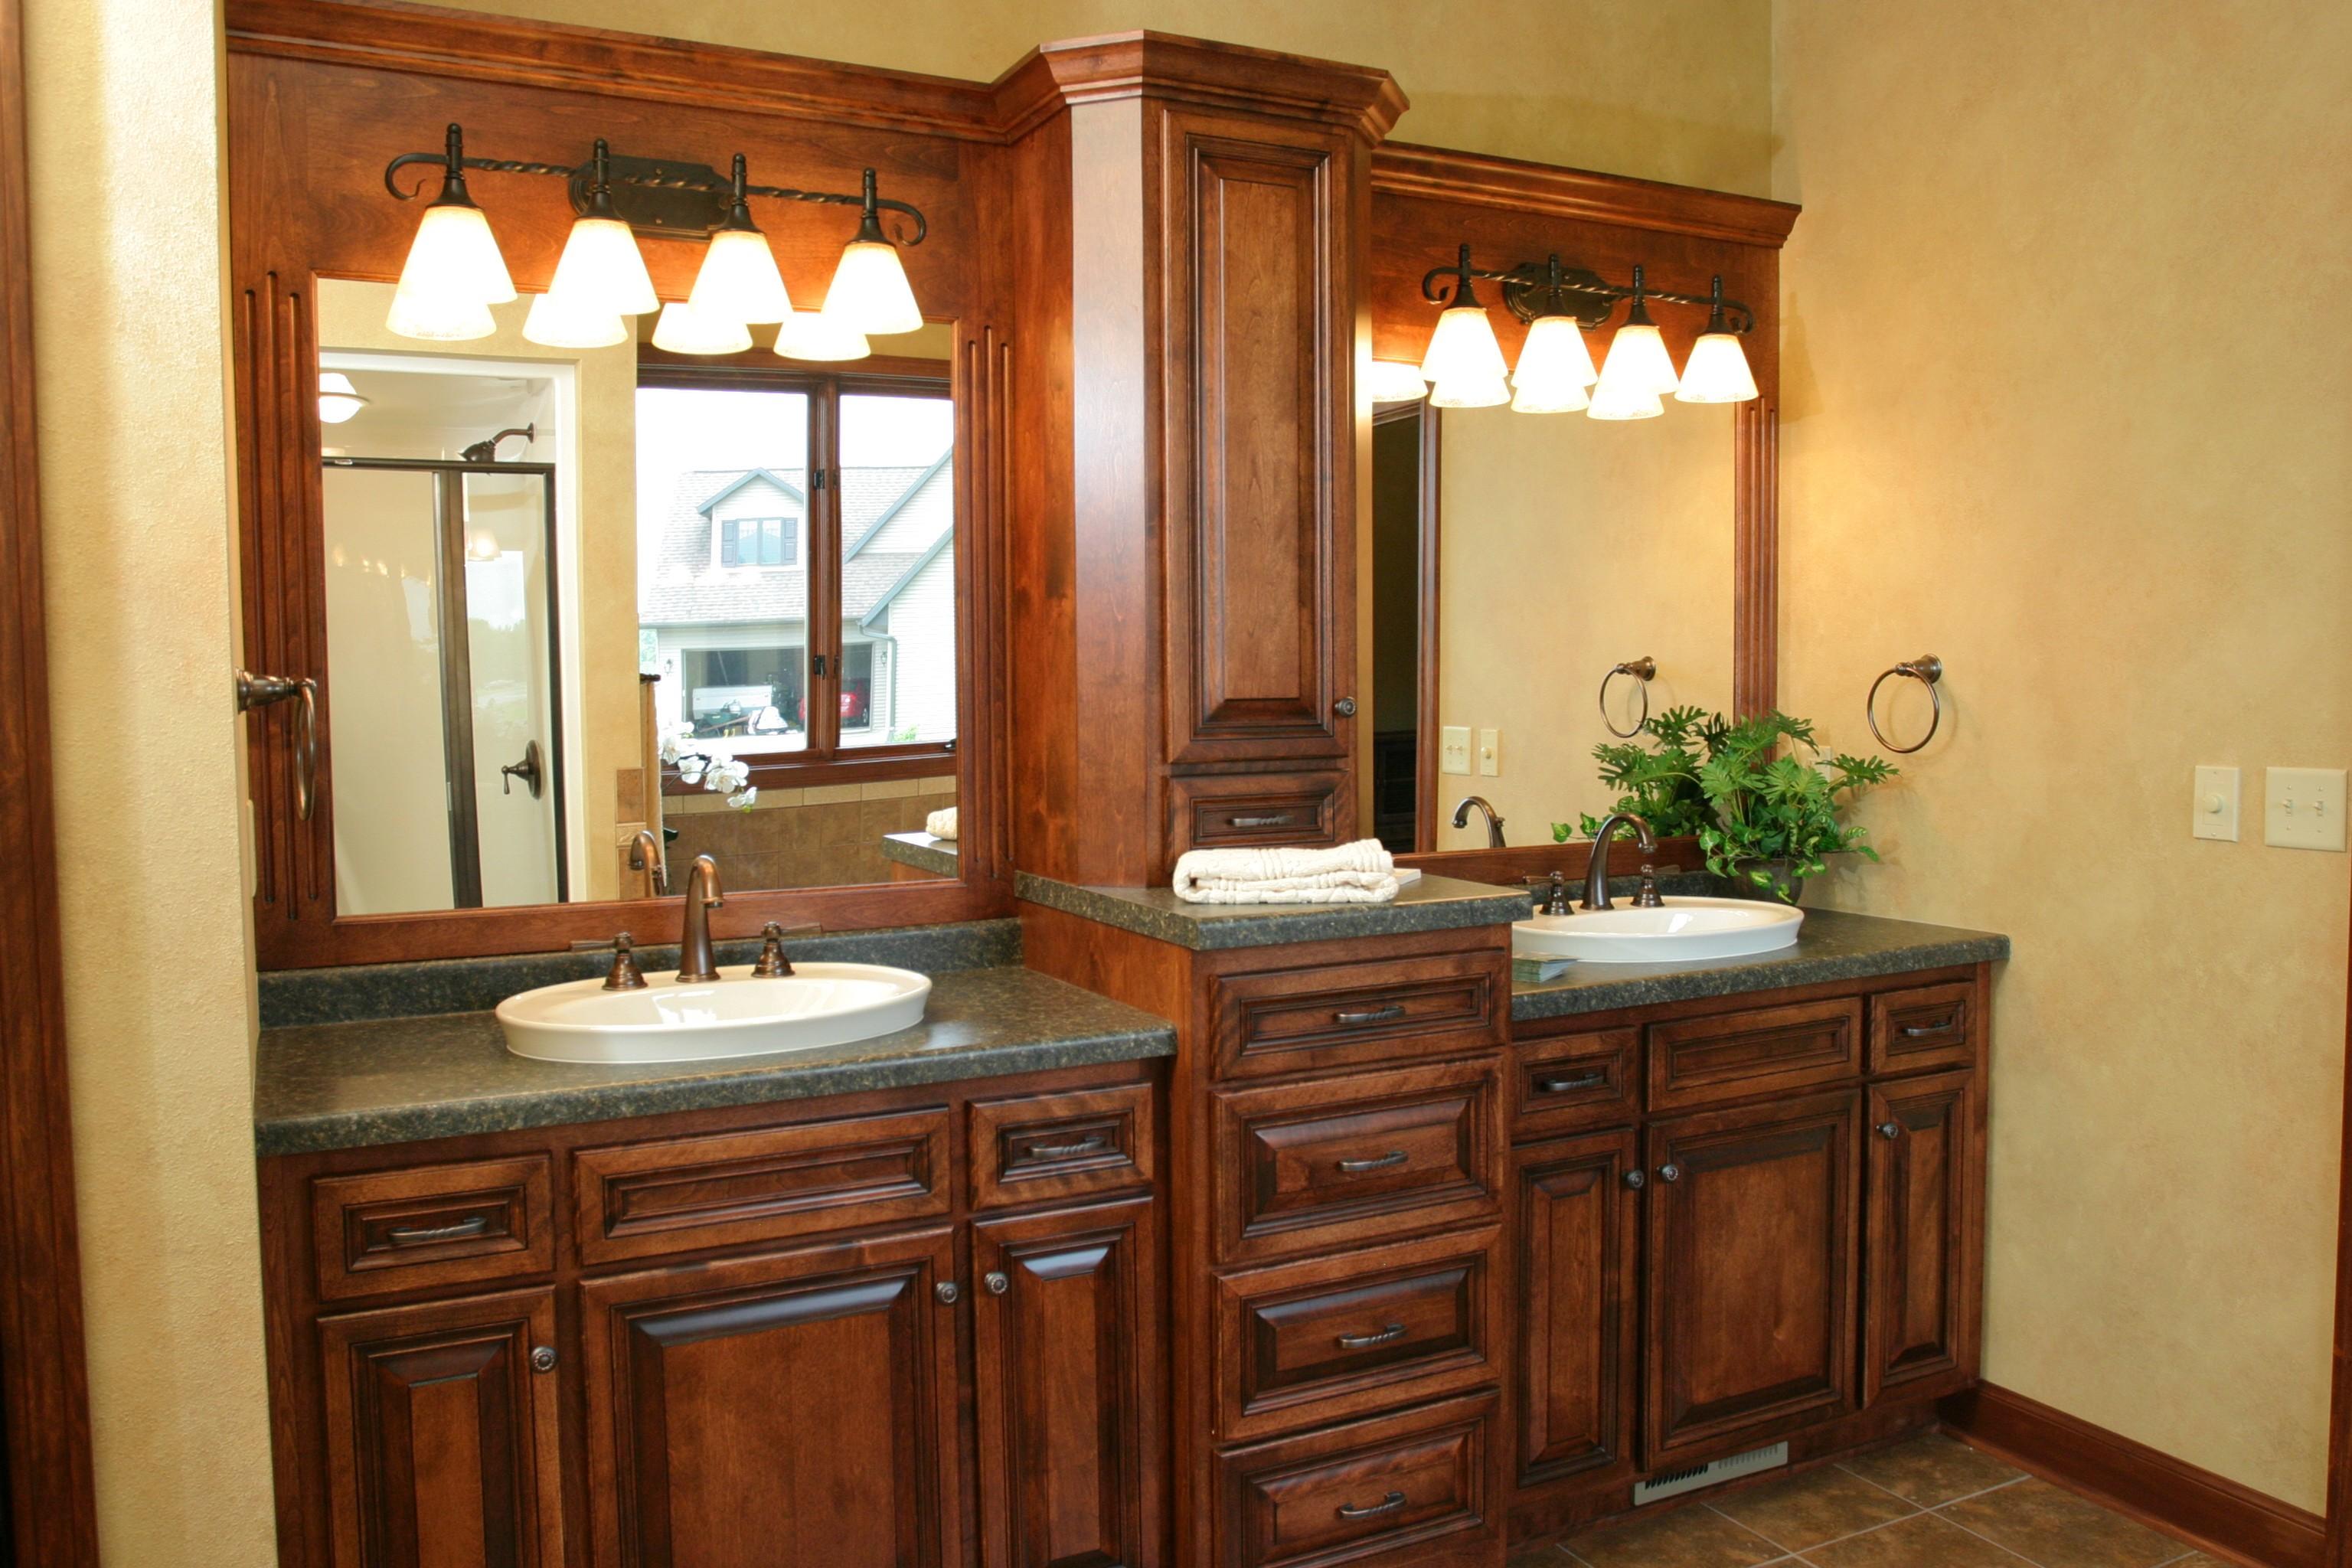 Custom Bathroom Vanities Amazing Incredible Custom Bathroom Cabinets for Interior Decor Inspiration Online